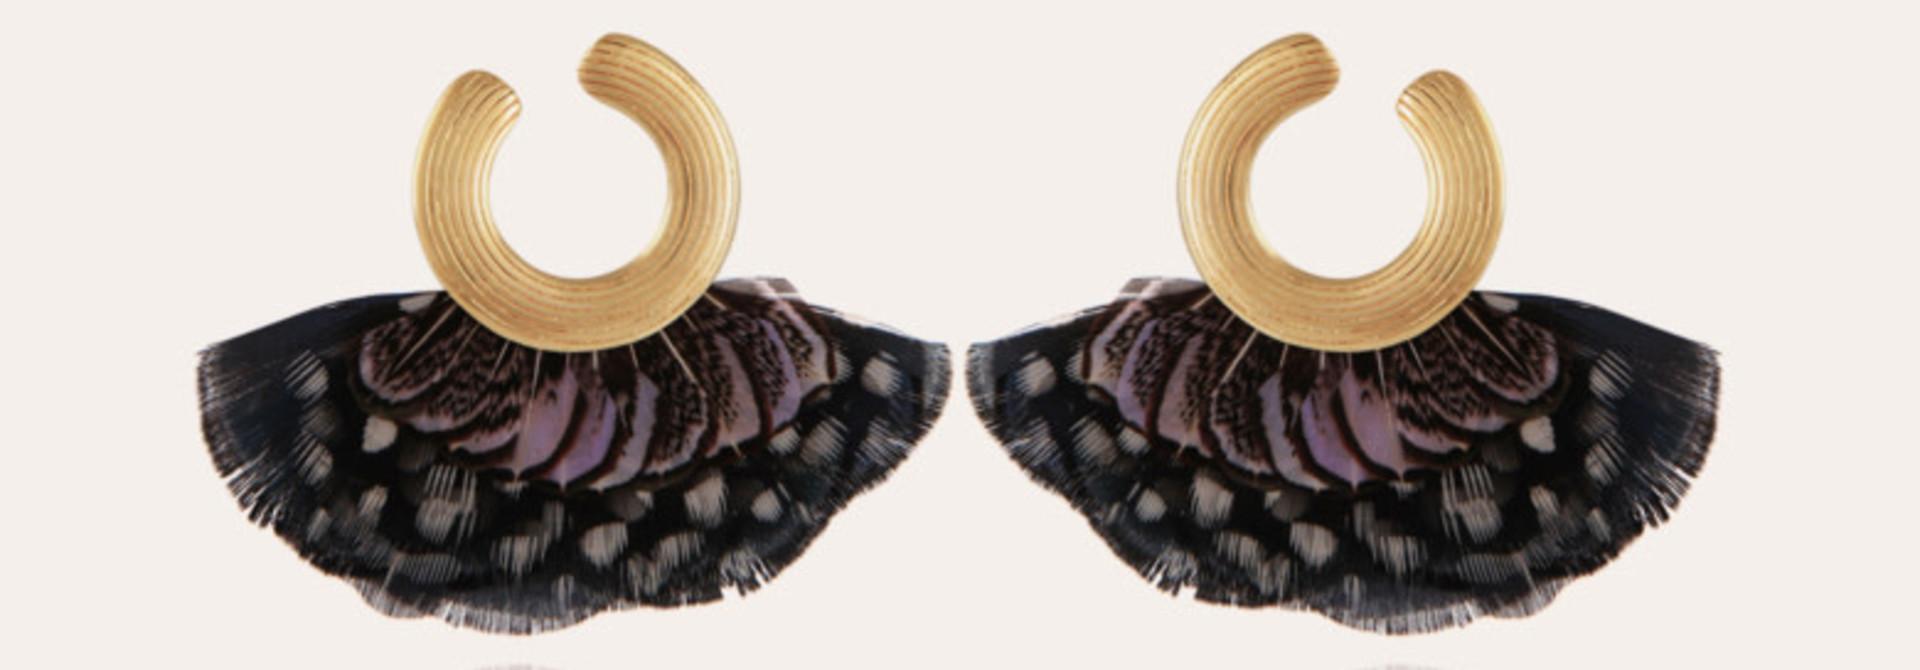 positano earrings